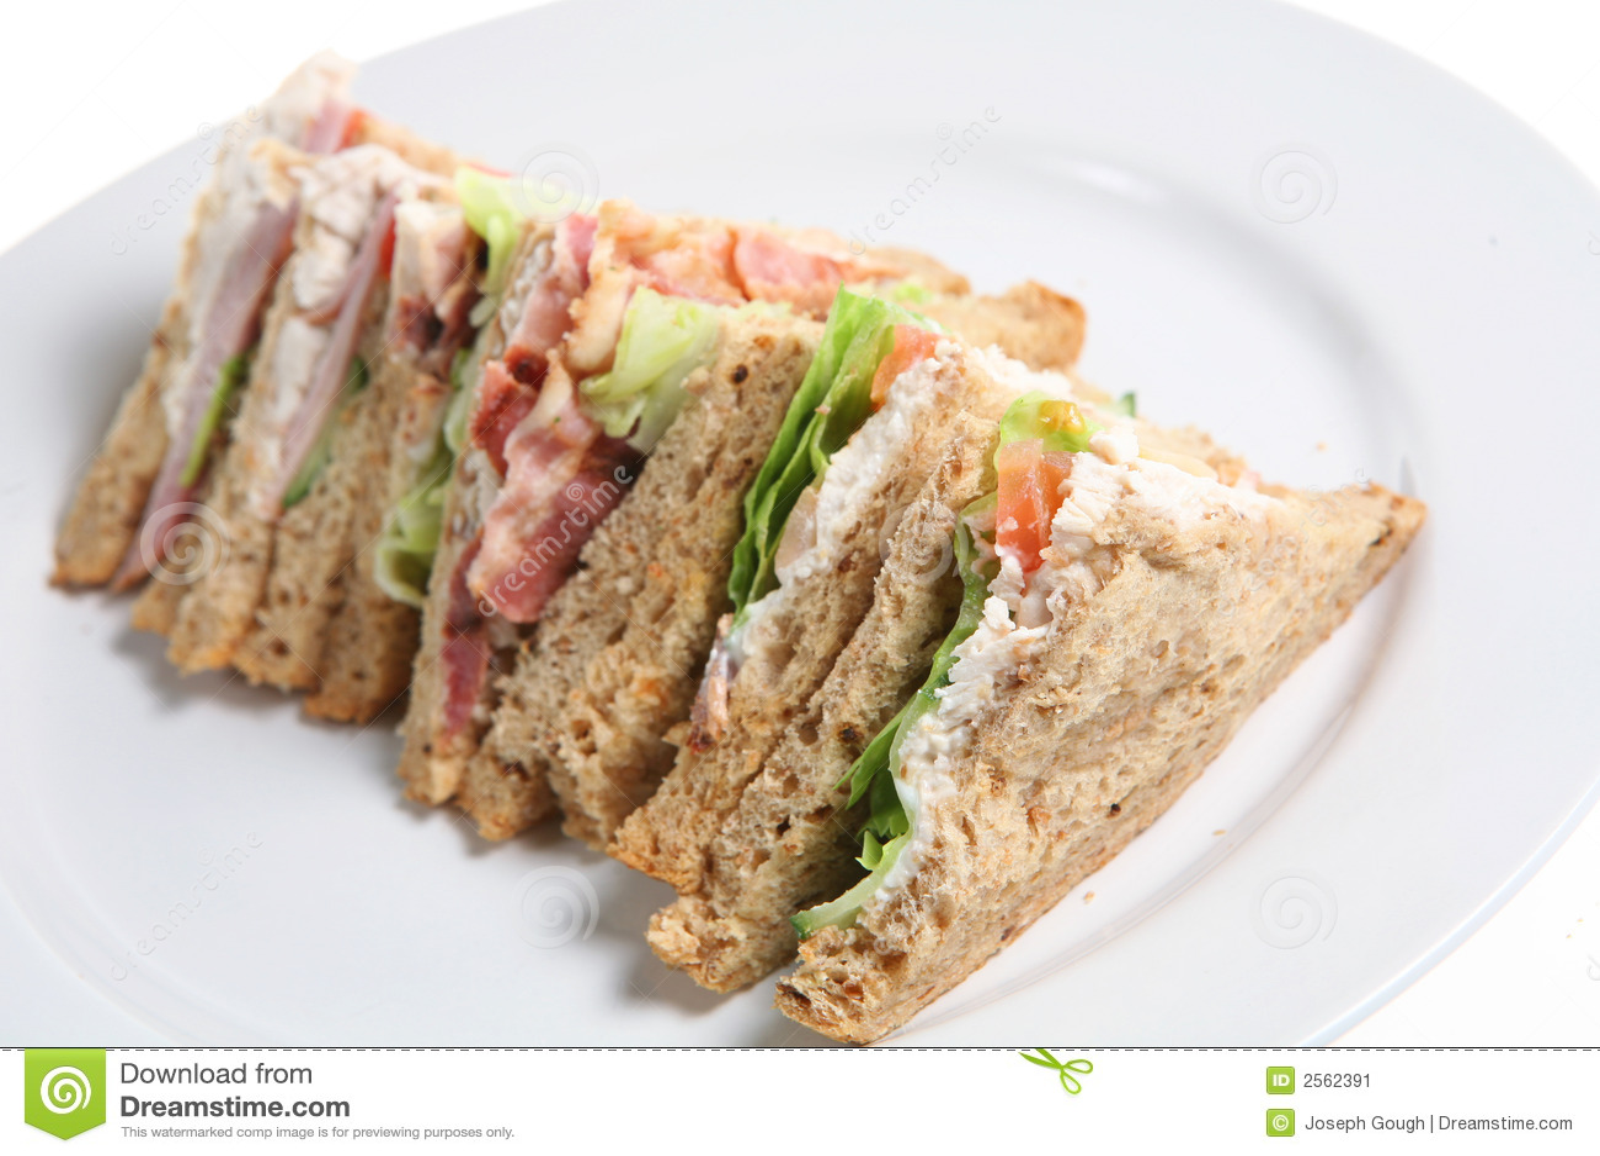 Sandwiches Stock Image Image 2562391